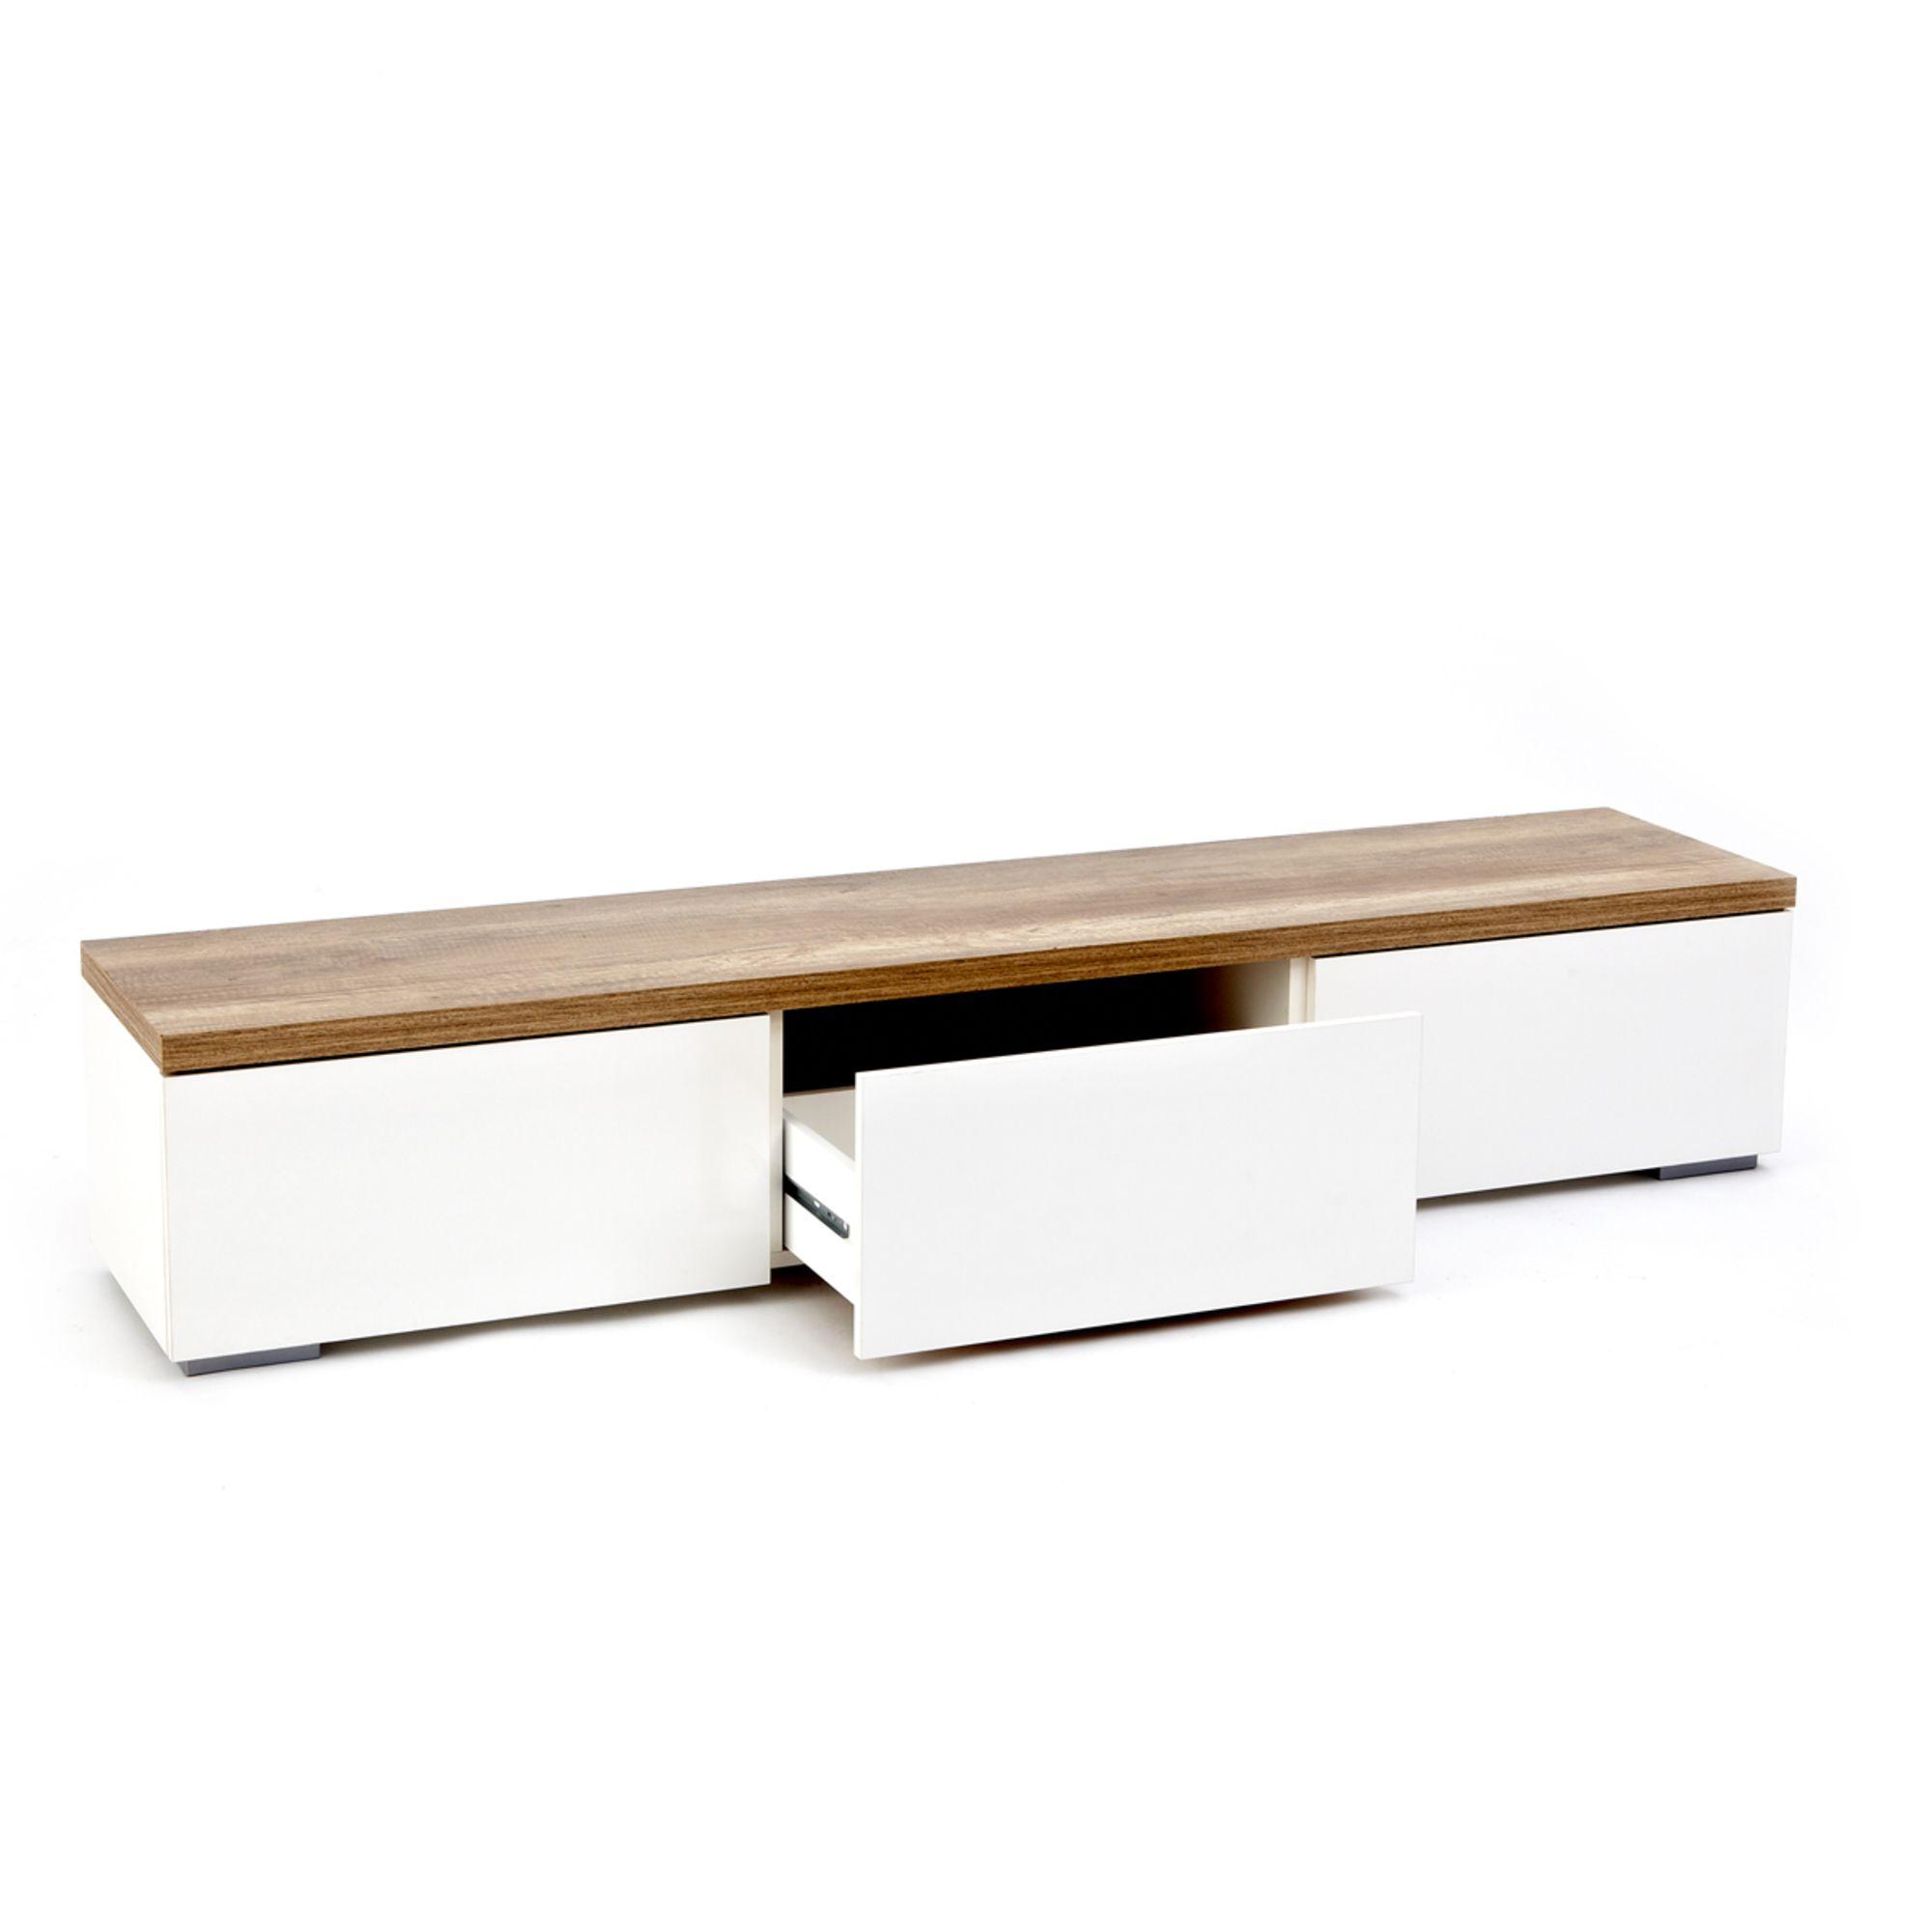 impressionen lowboard mit elegantem korpus in wei und. Black Bedroom Furniture Sets. Home Design Ideas